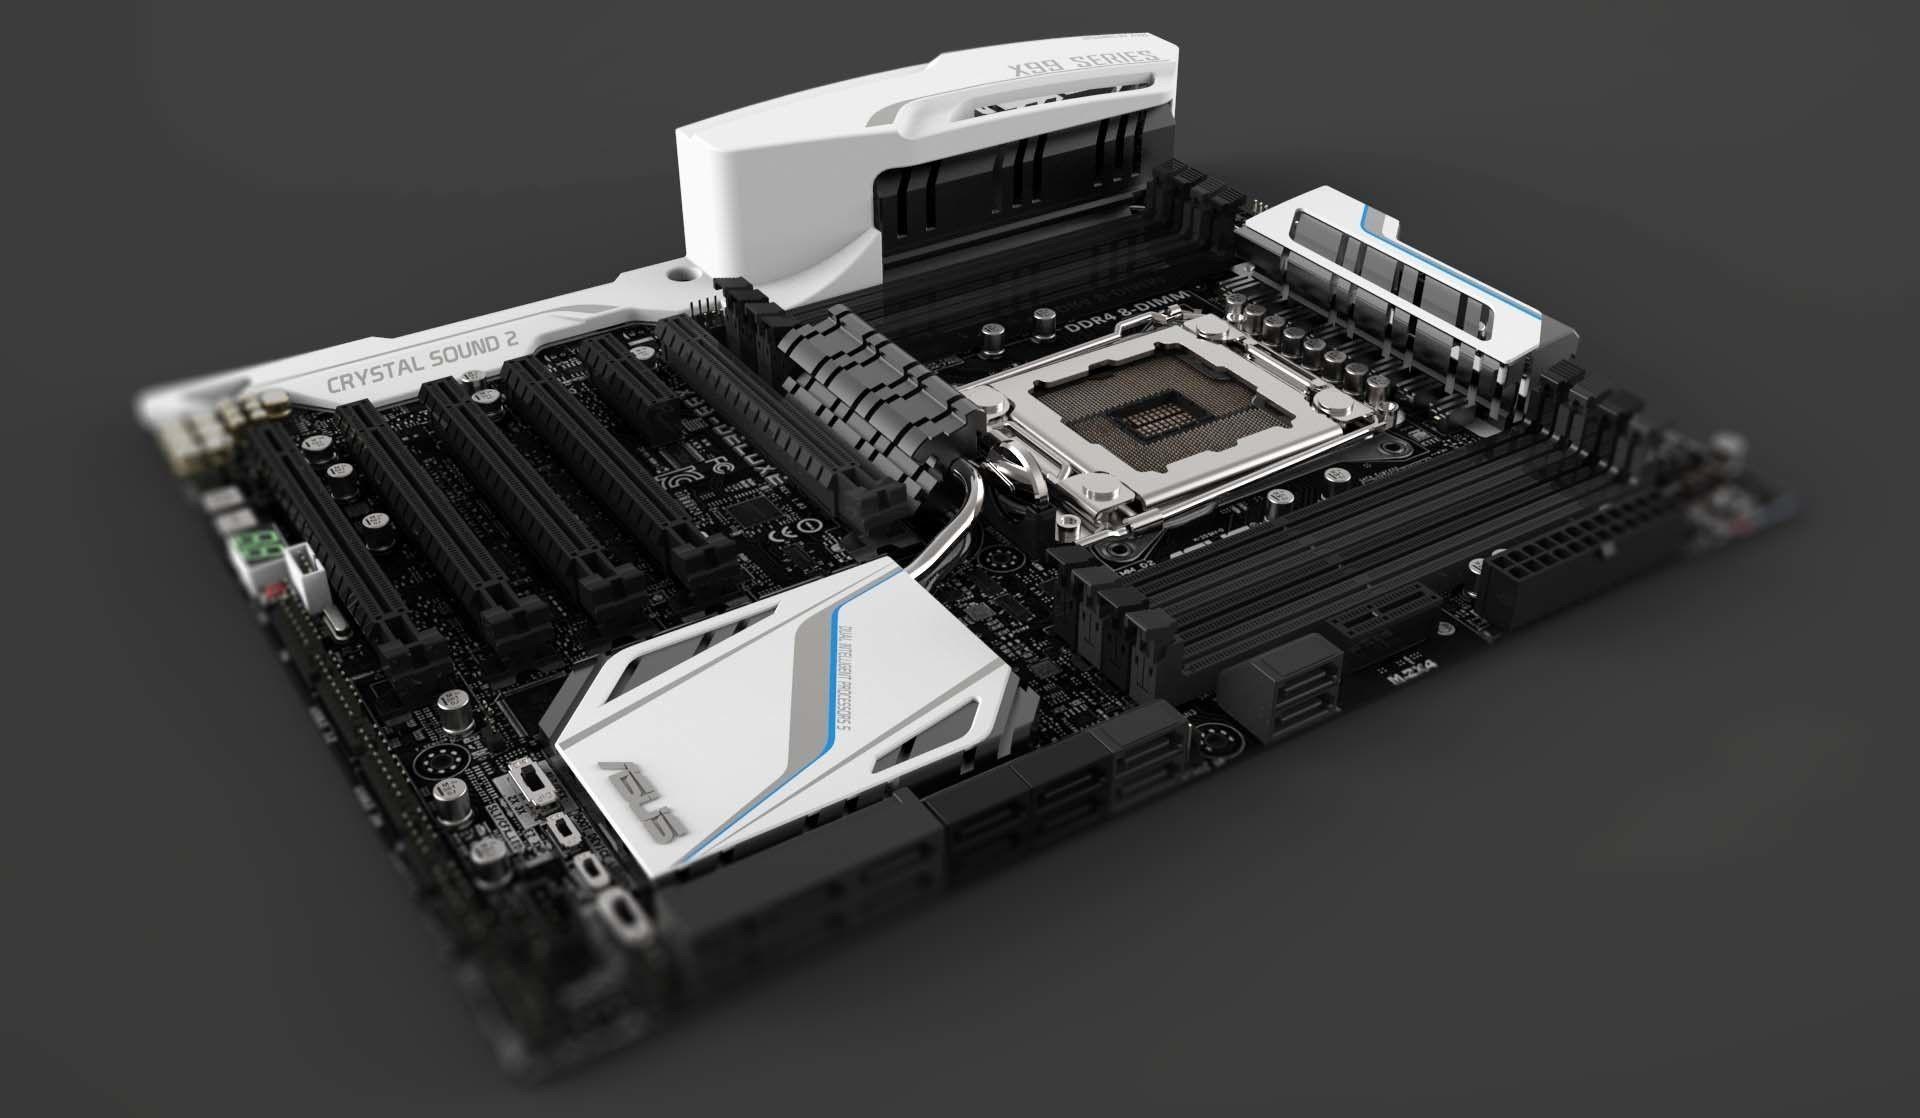 Asus X99 Deluxe LGA 2011-3 Motherboard | 3D model